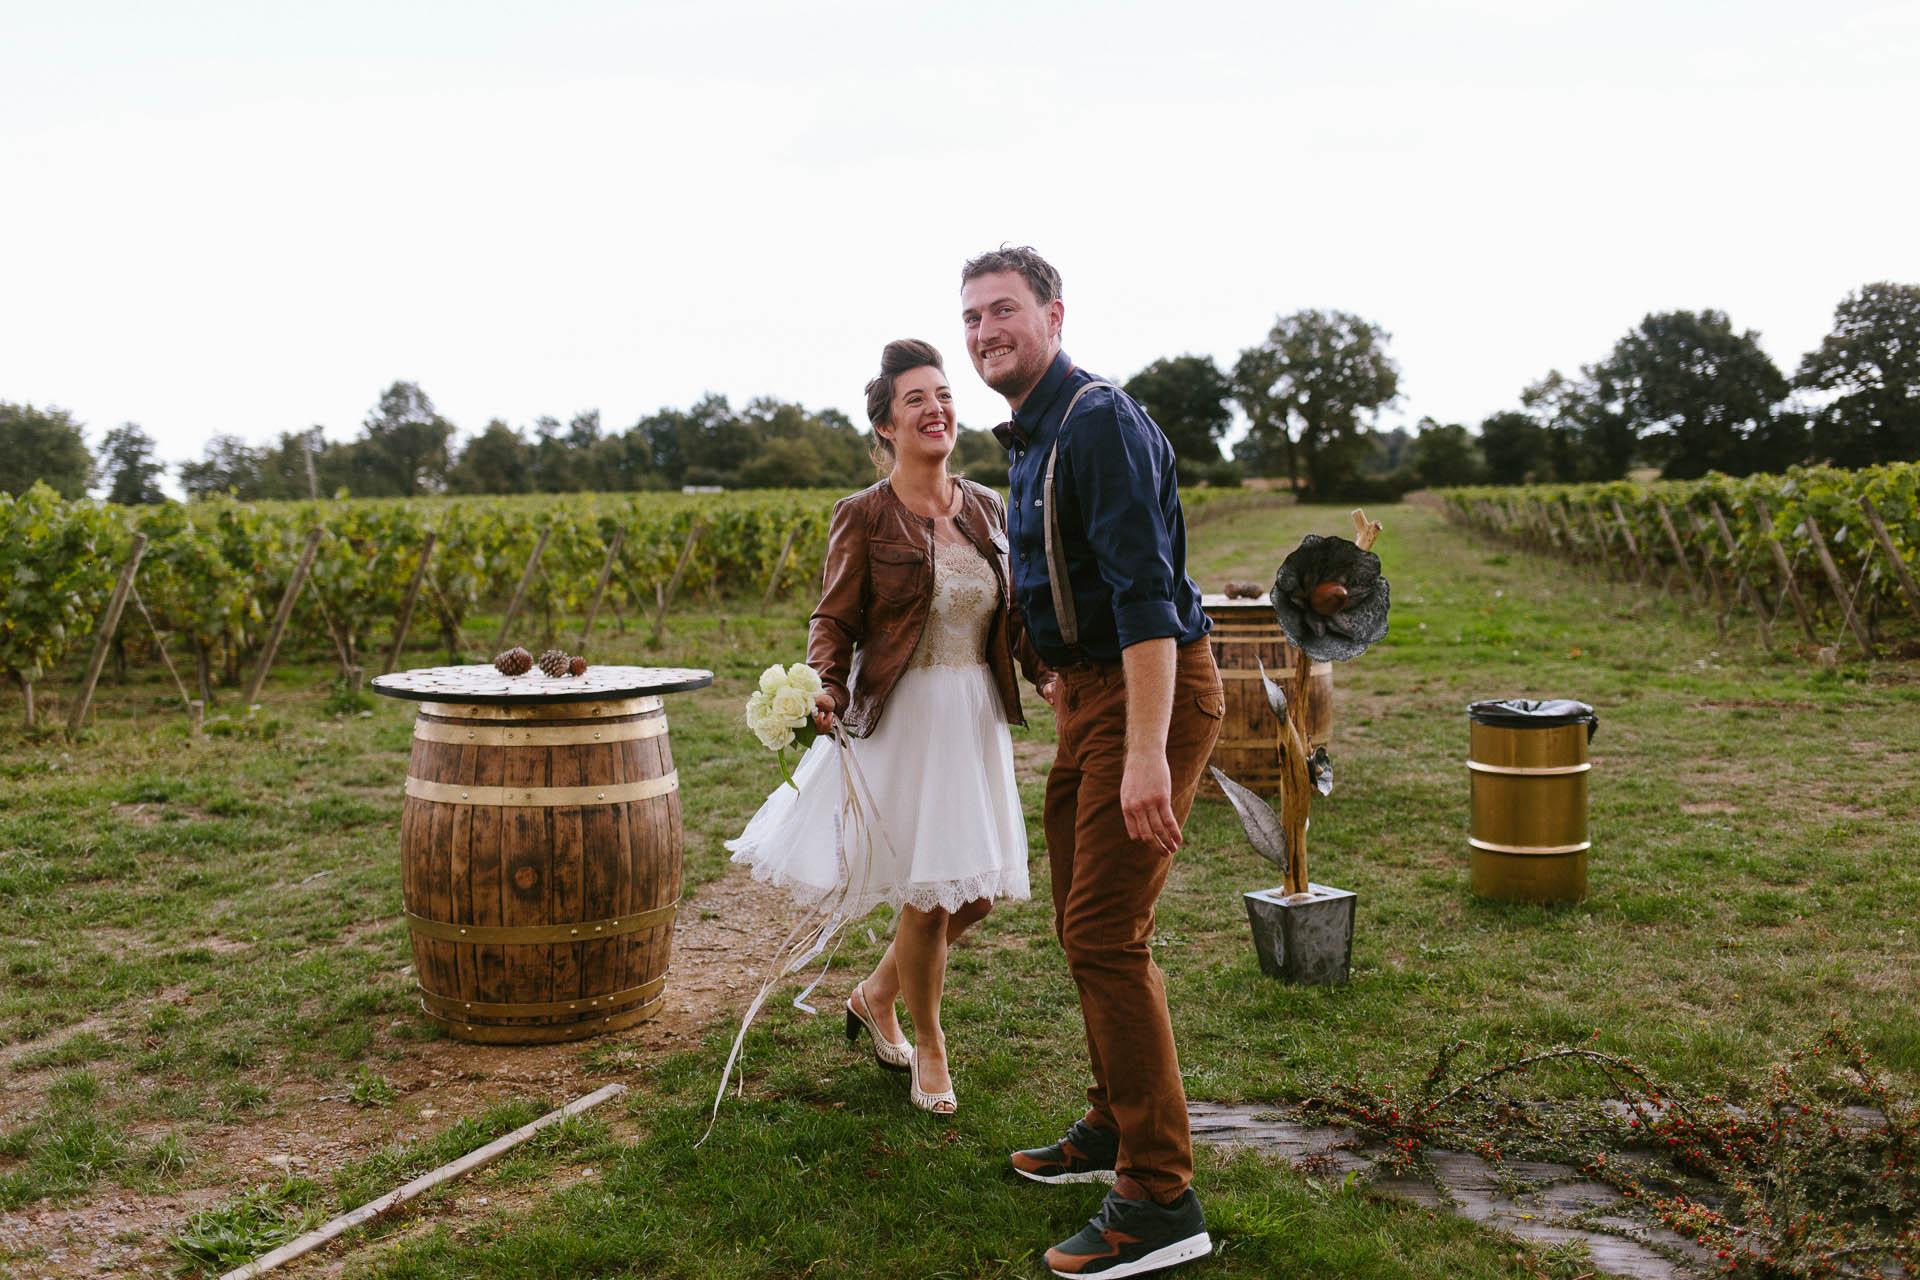 mariage_vignobles_mourat_vendee_jeremy_agathe_flavie_nelly-142